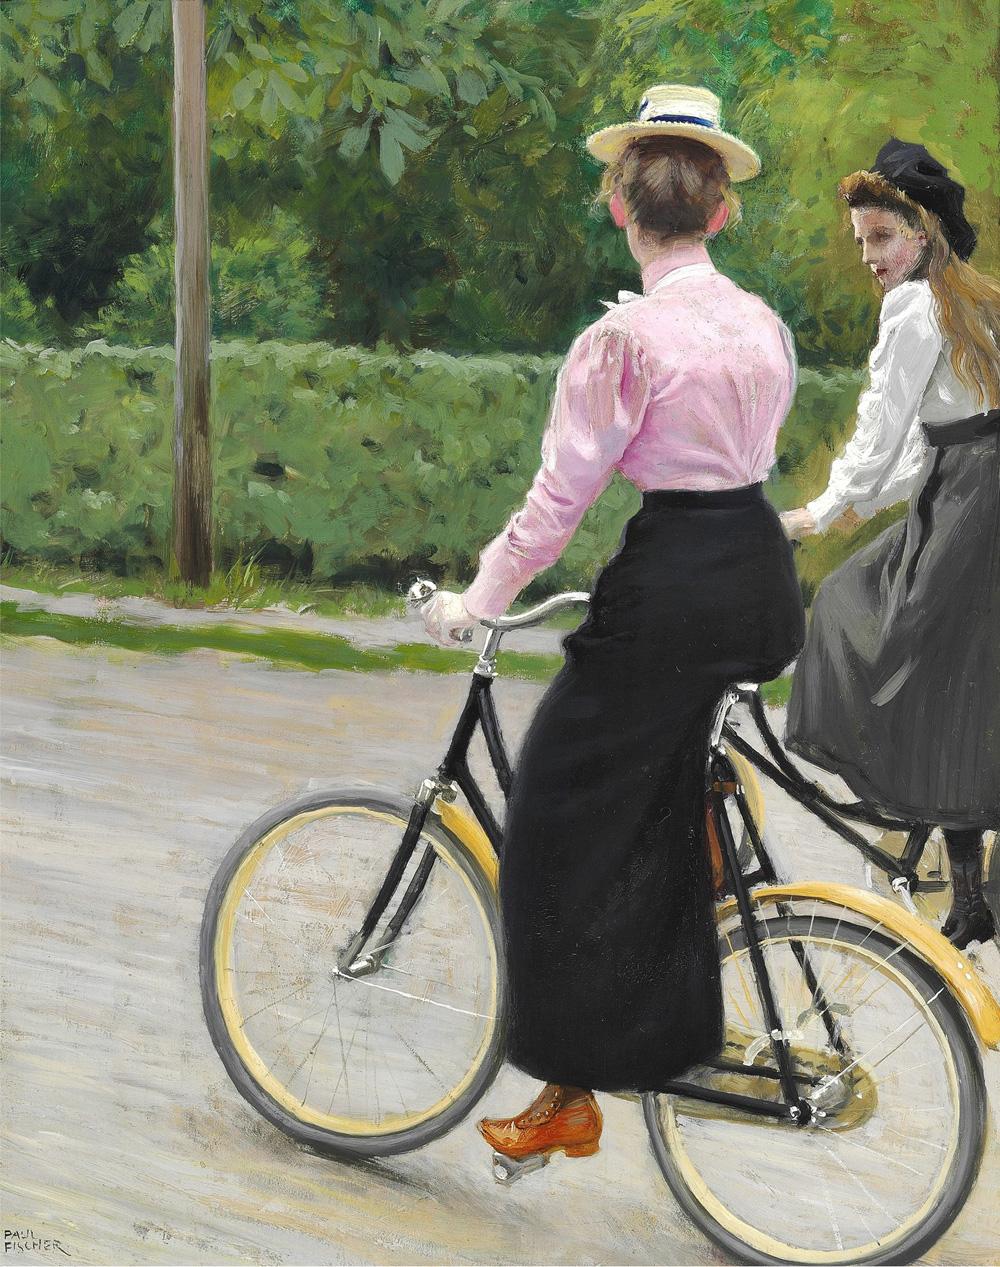 ZENSINY-NA-VELOSIPEDAK-Two-young-women-making-a-ride-on-their-bikes-a-summer-day_41-K-33_K.M._CASTNOE-SOBRANIE.jpg